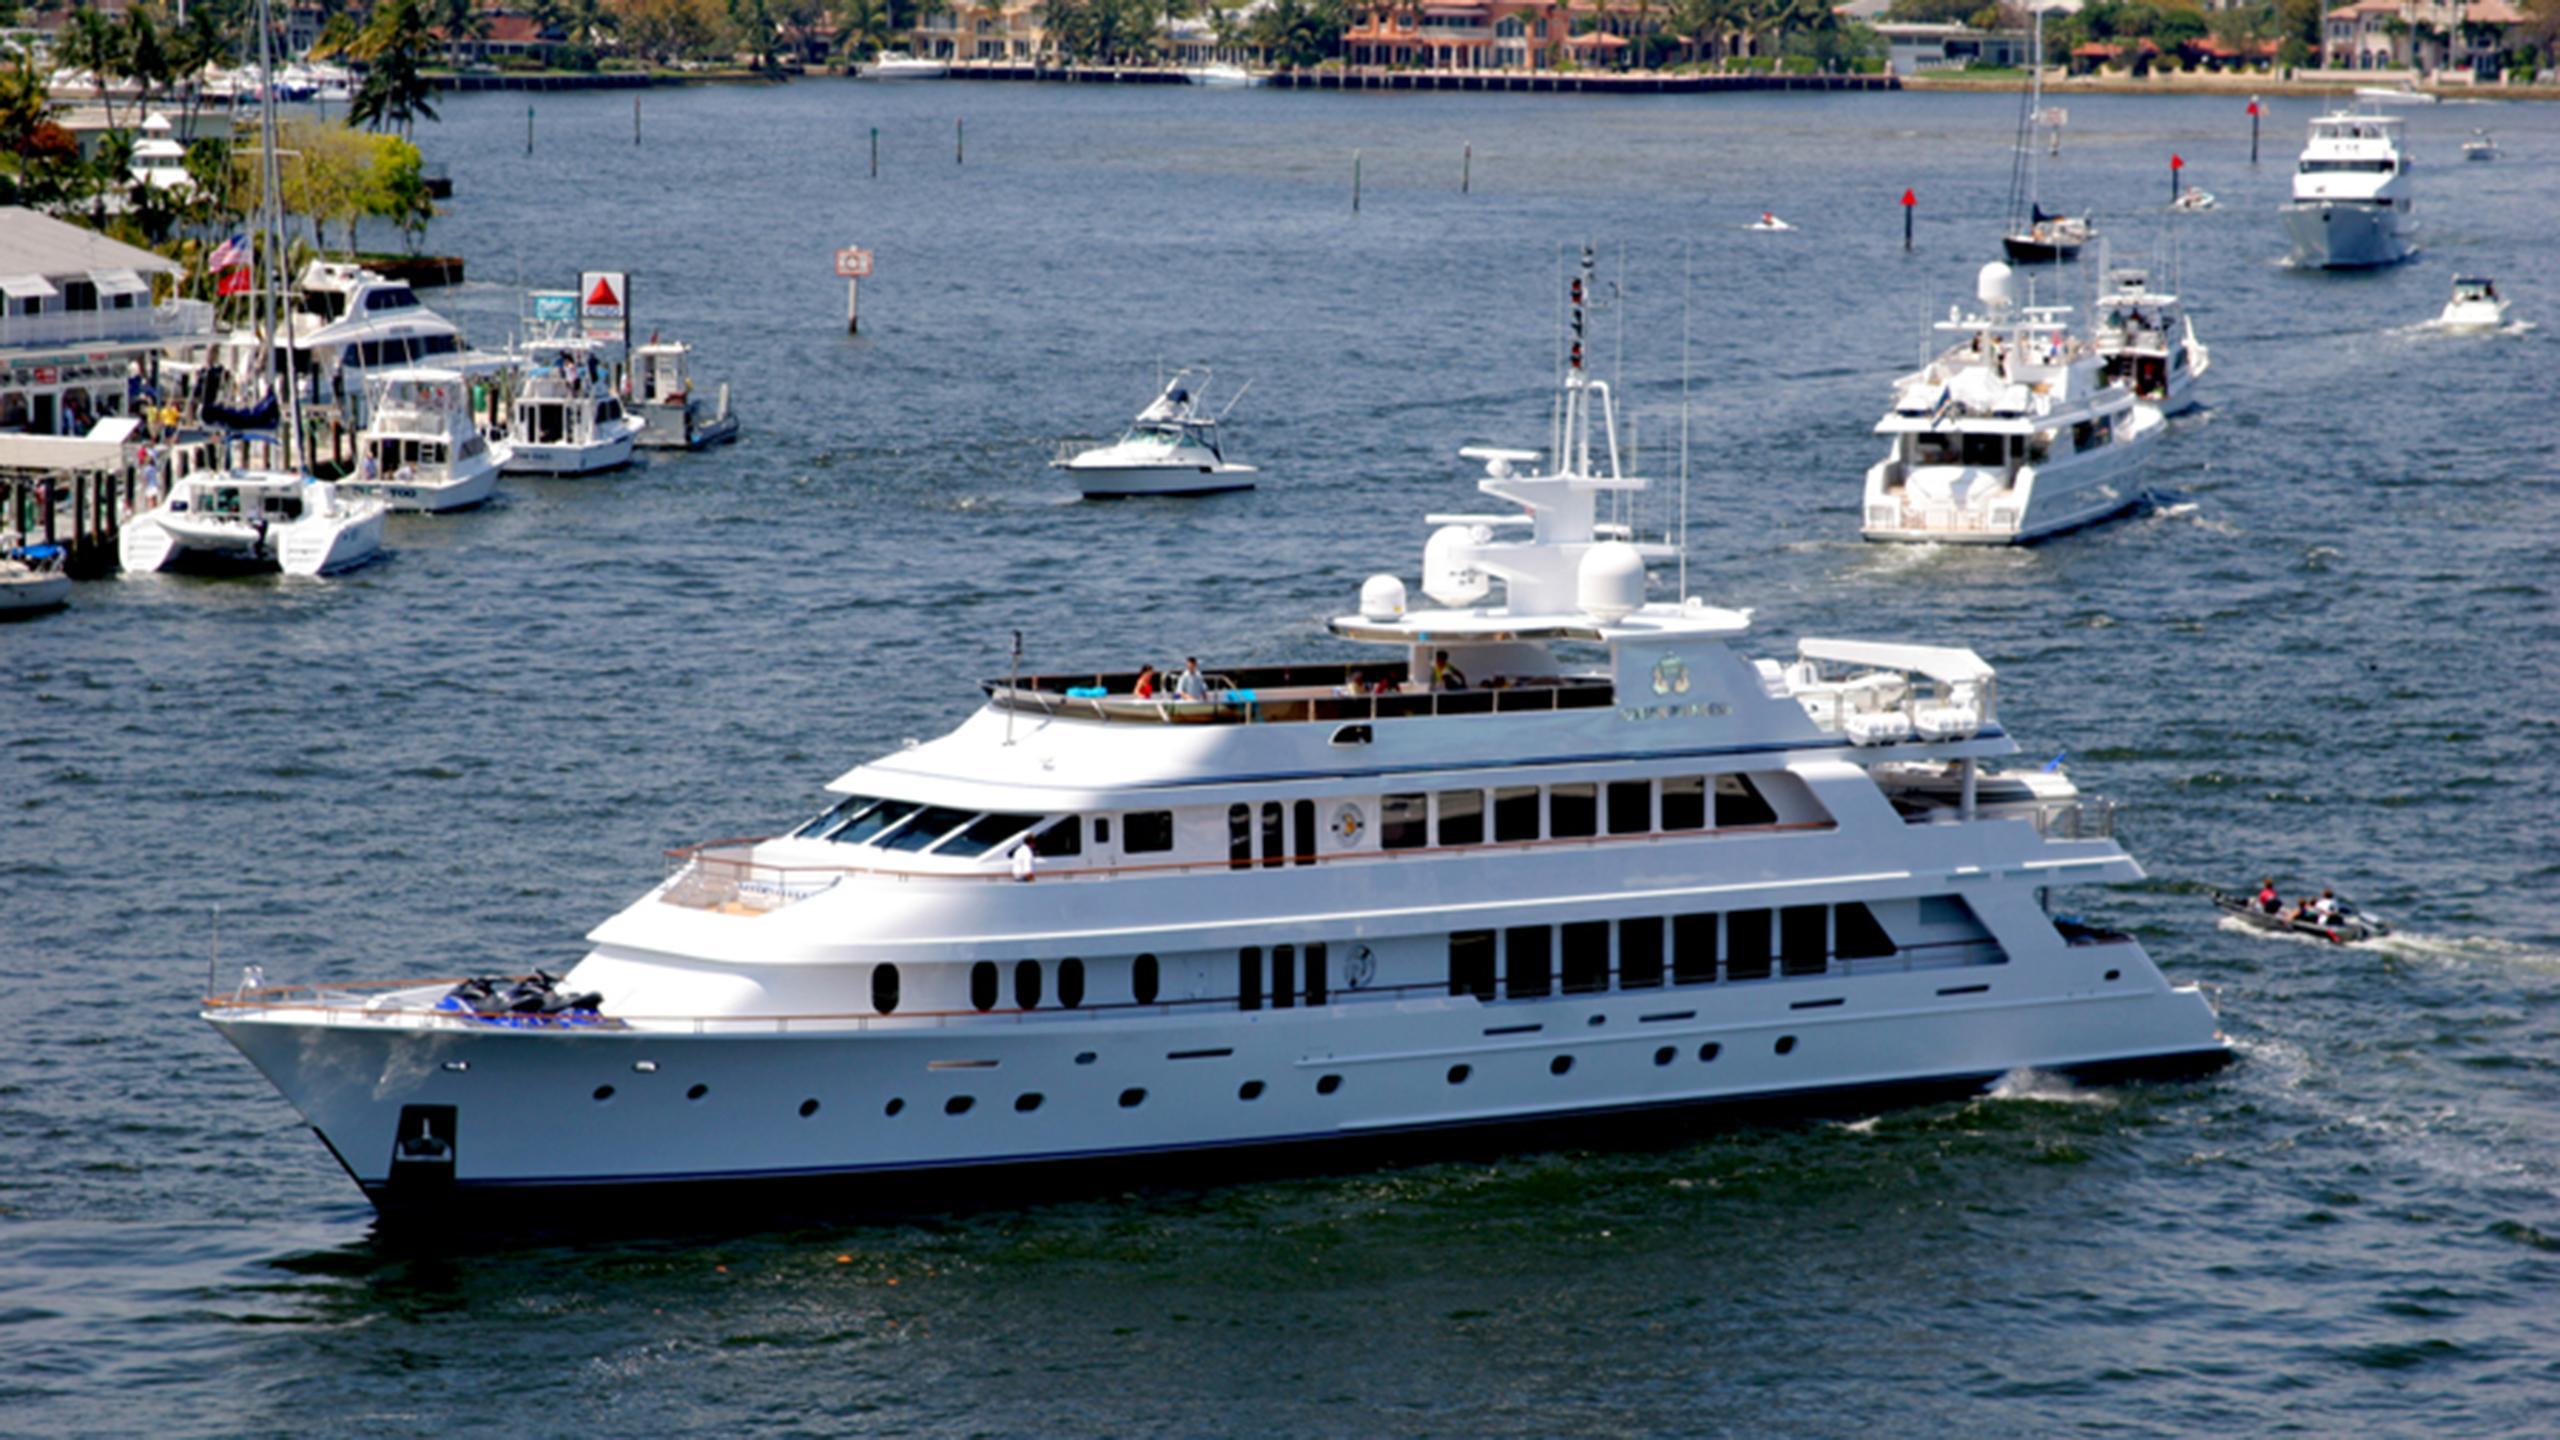 ionian-princess-motor-yacht-christensen-palmer-johnson-savannah-2005-46m-profile